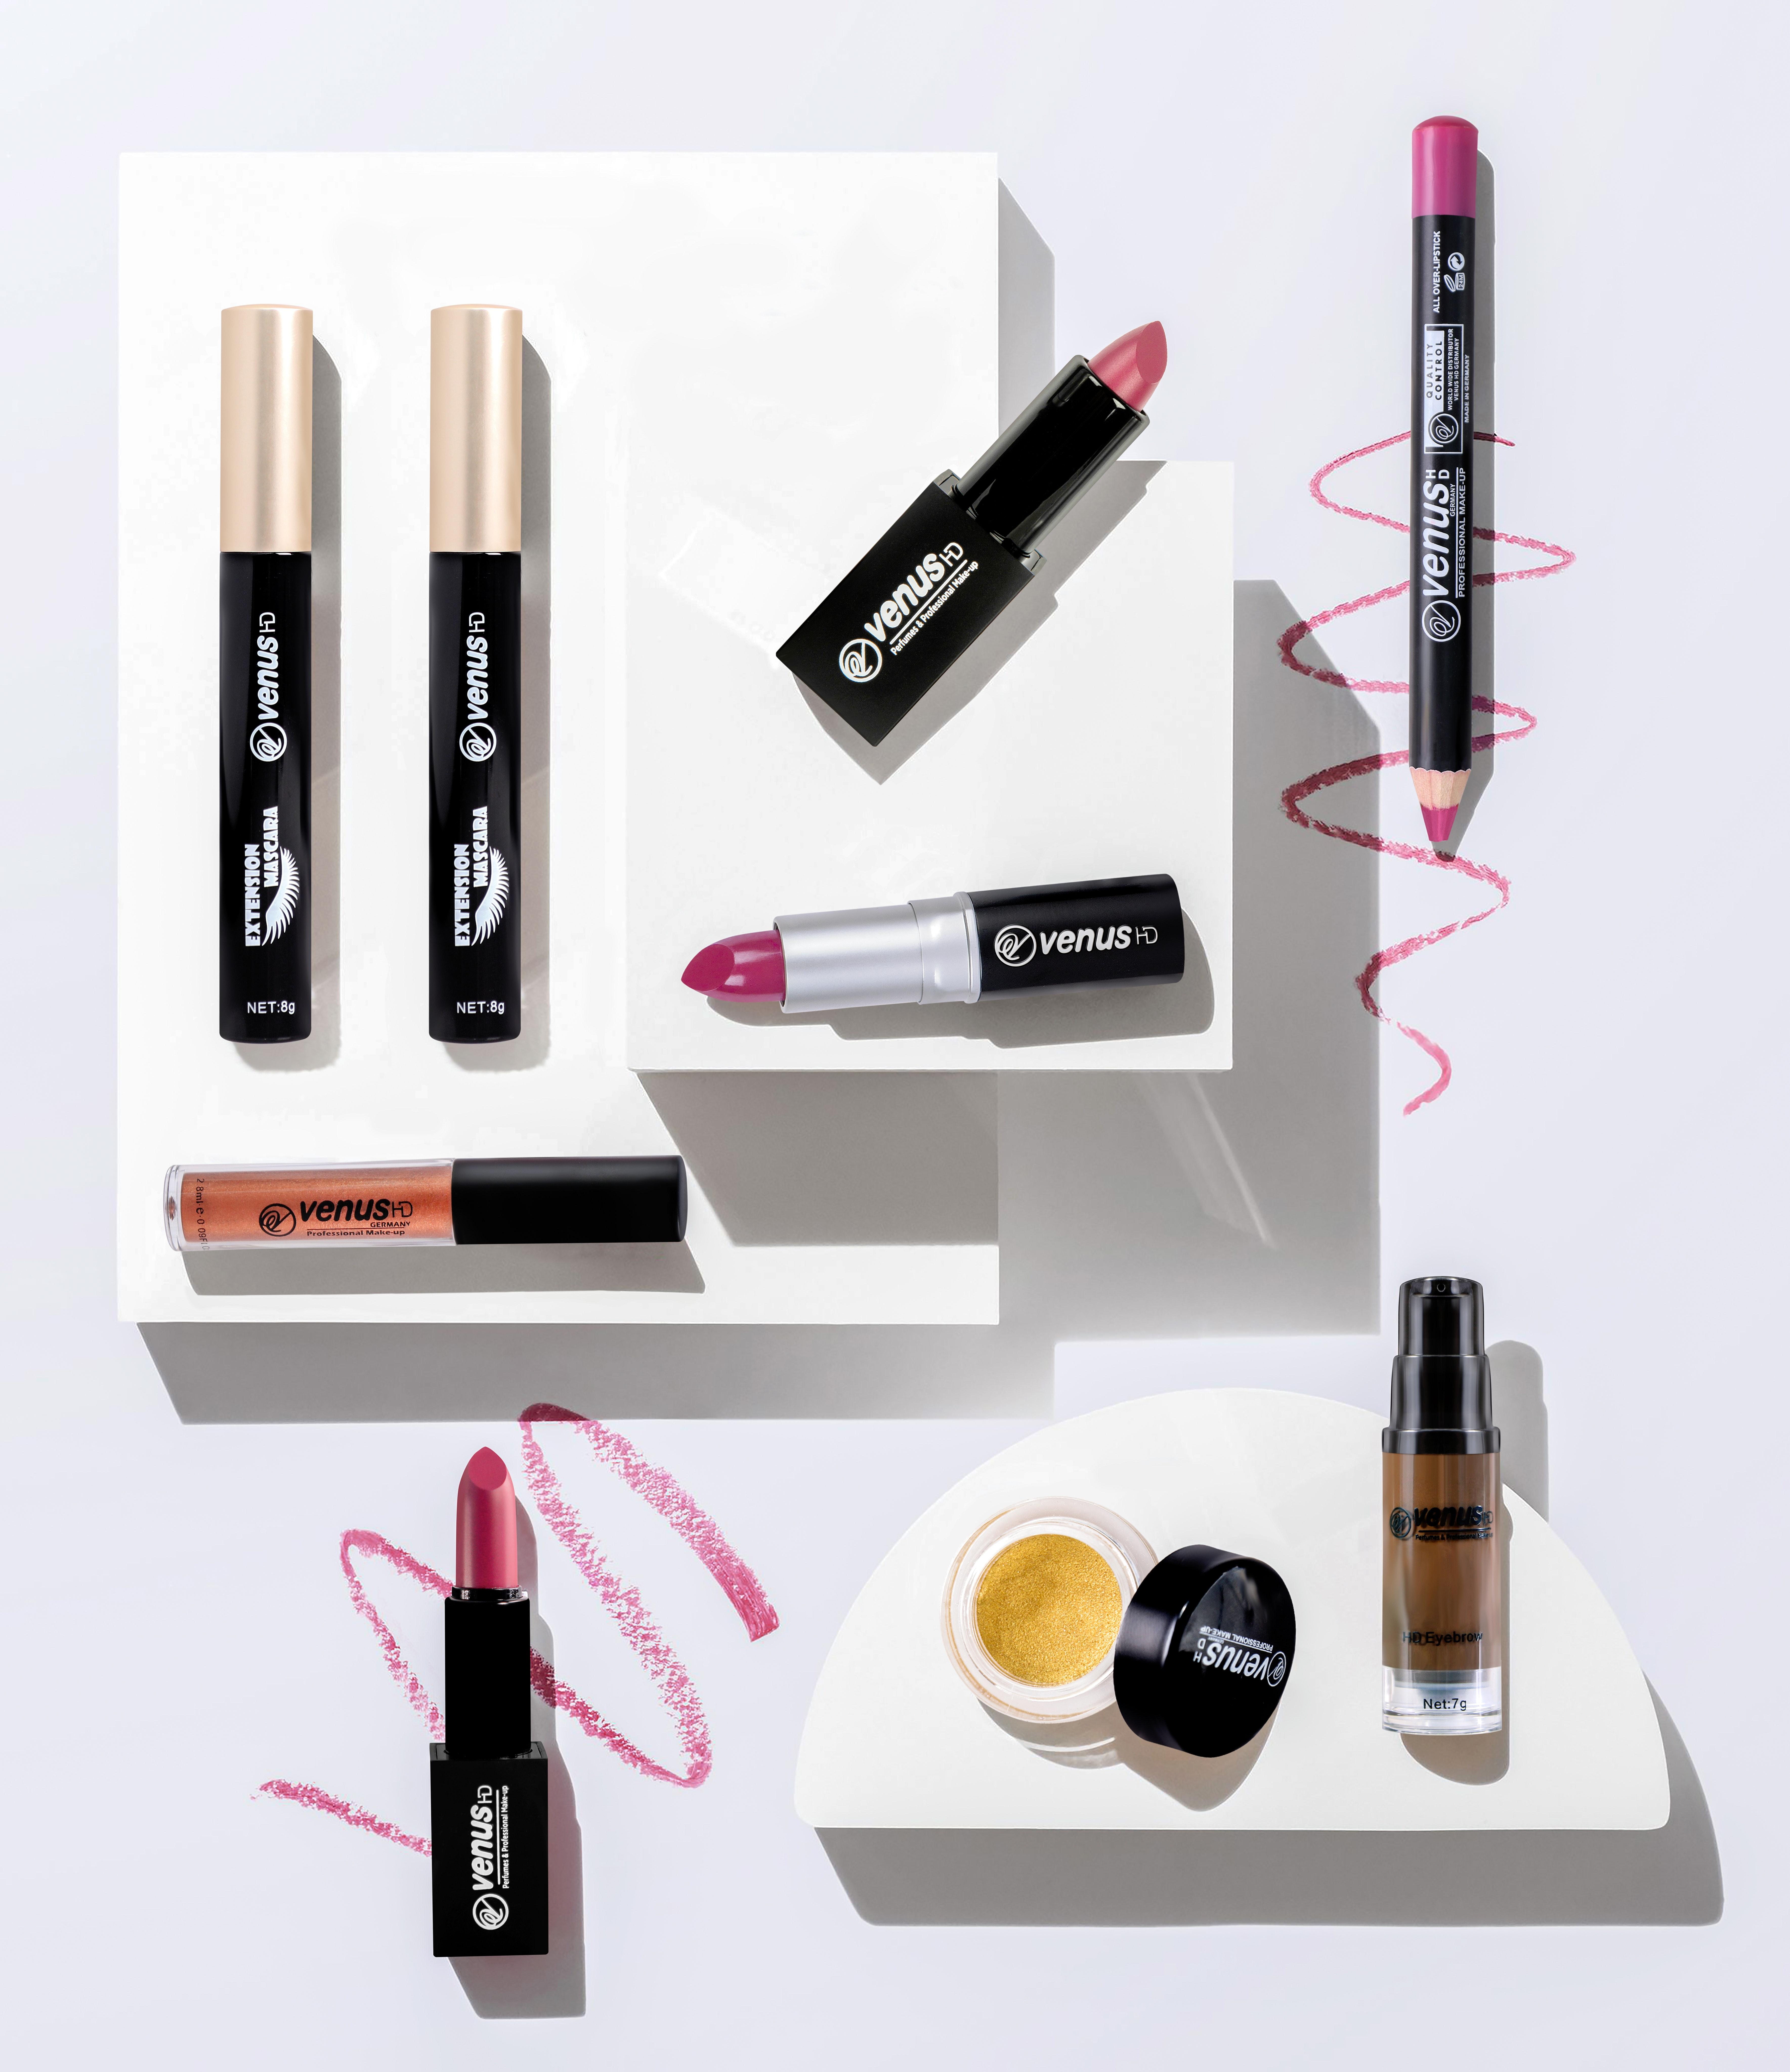 makeup, kerotaconus and eye health [skyezee fashionfit]